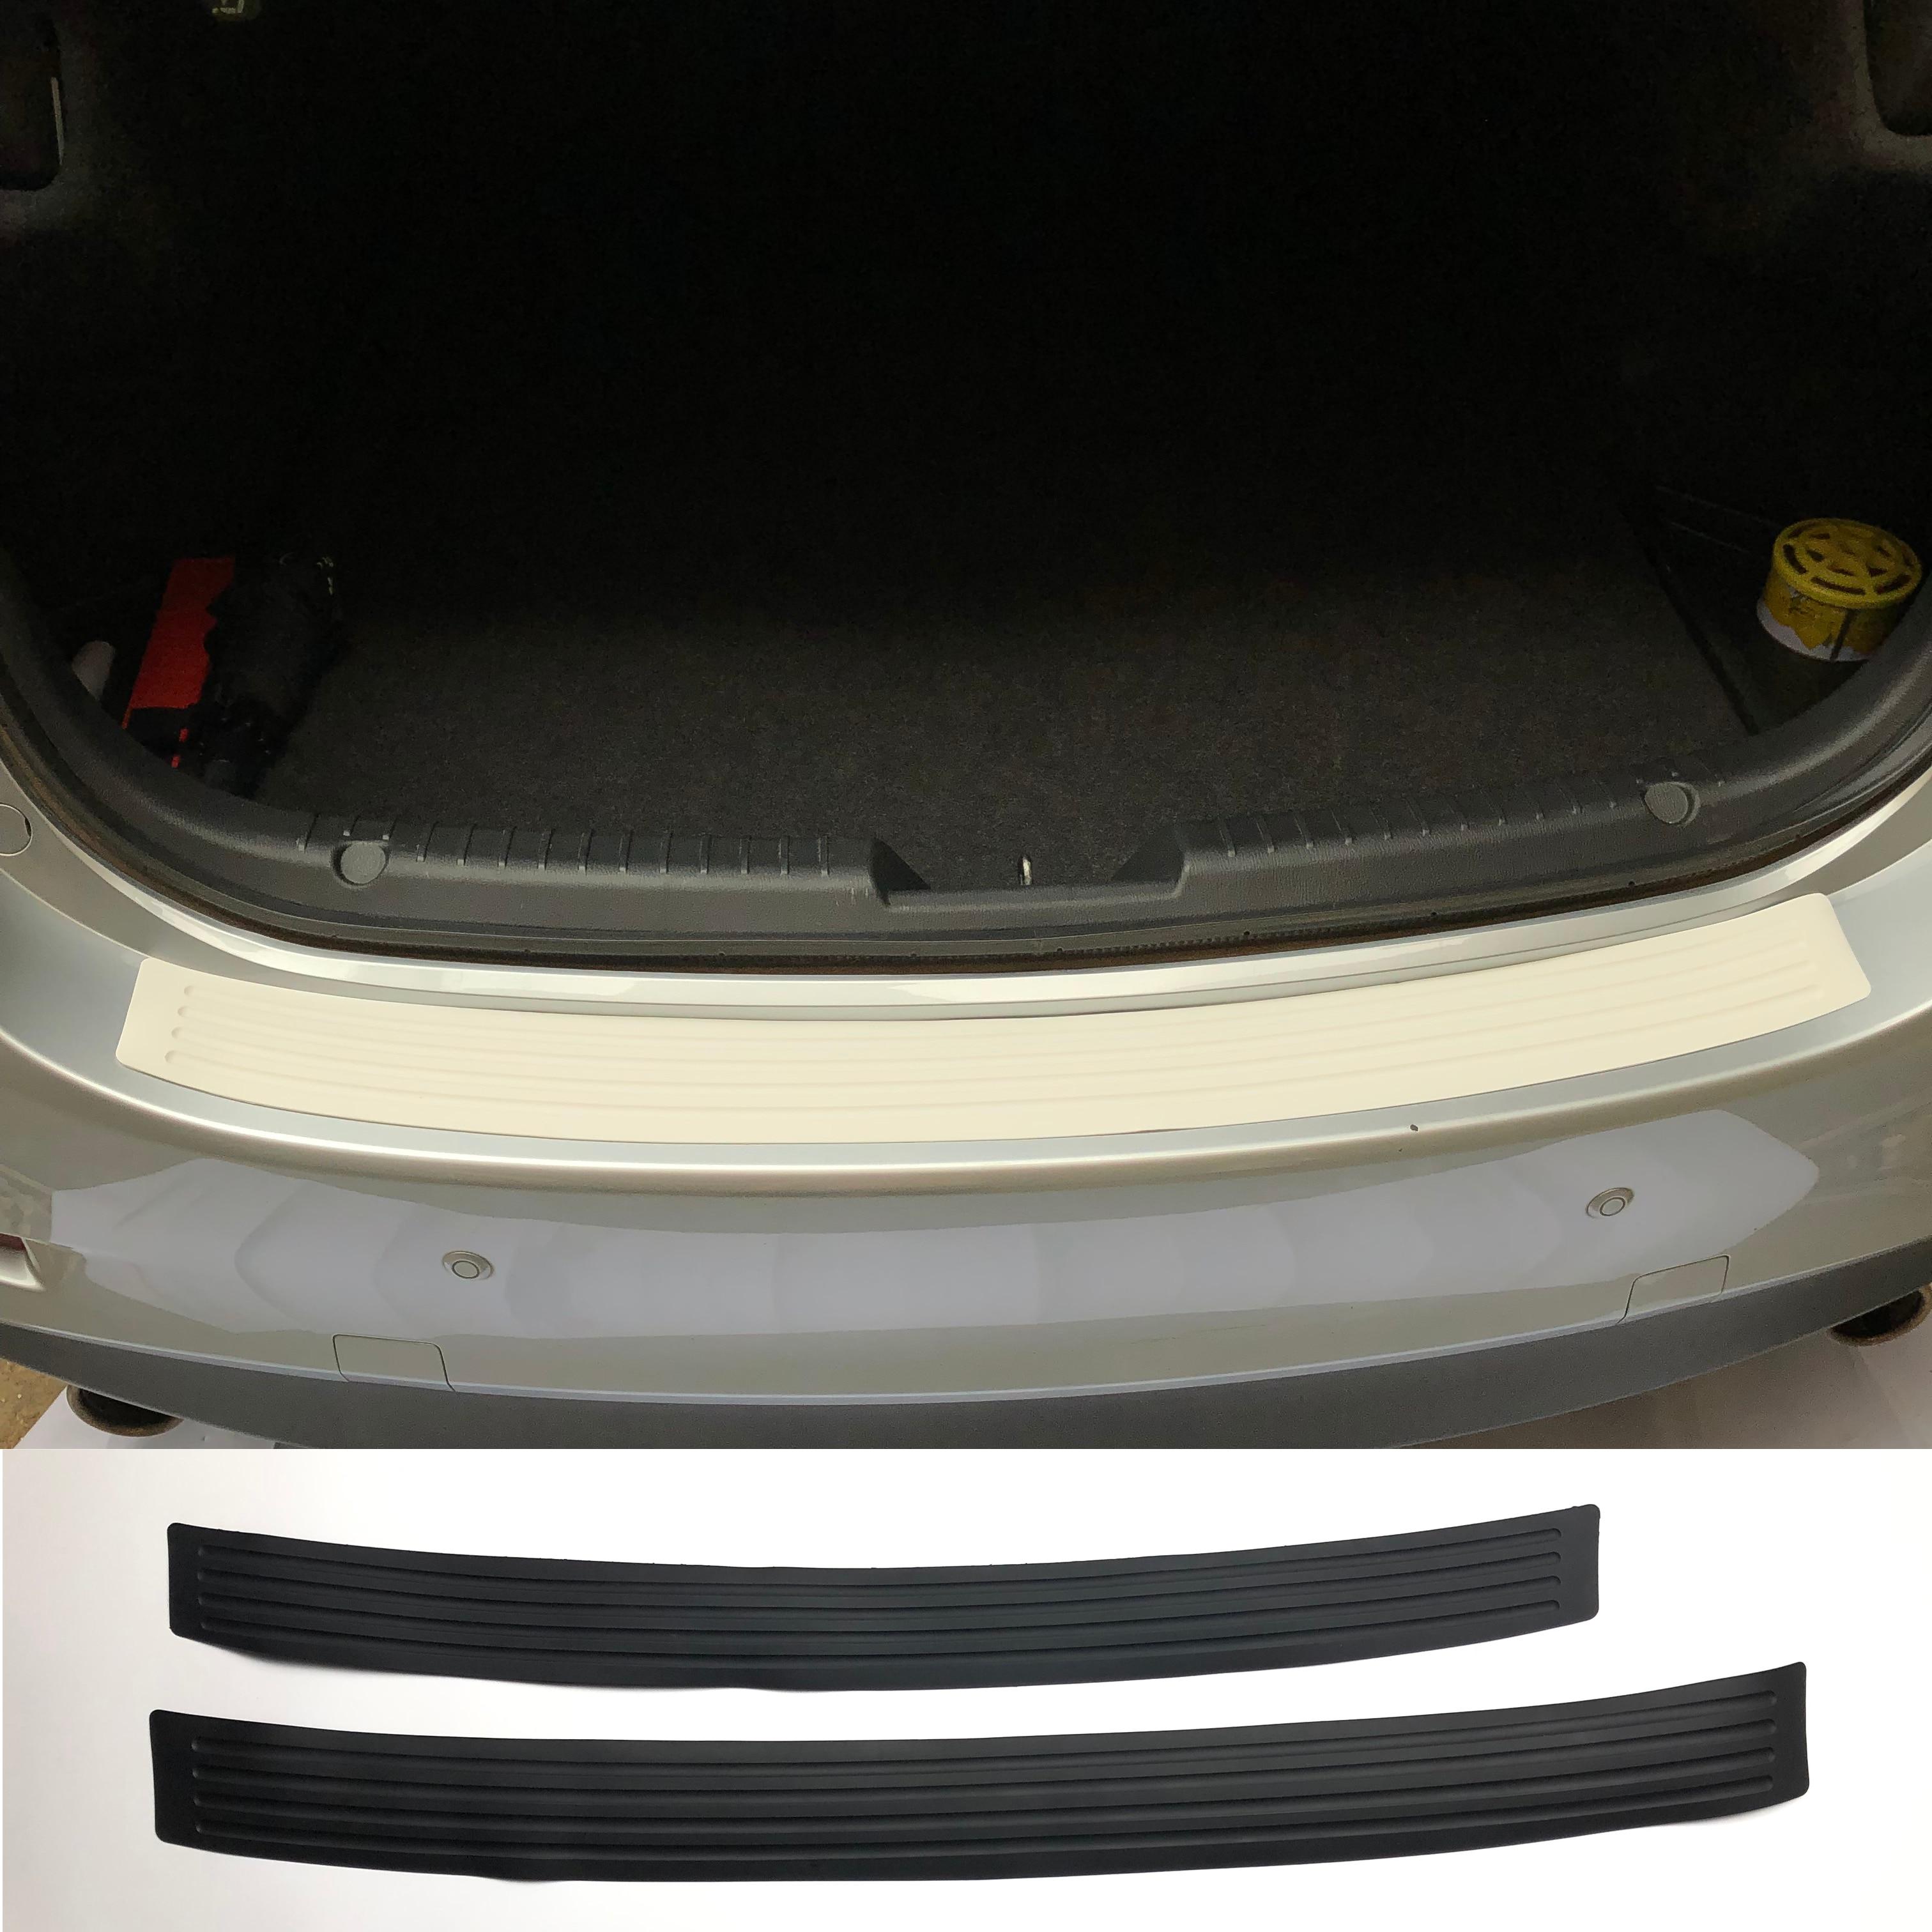 LSYBB Custodia per pastiglie Car Styling Car Cover per Nissan Nismo Qashqai Murano X Trail Teana 2015 2016